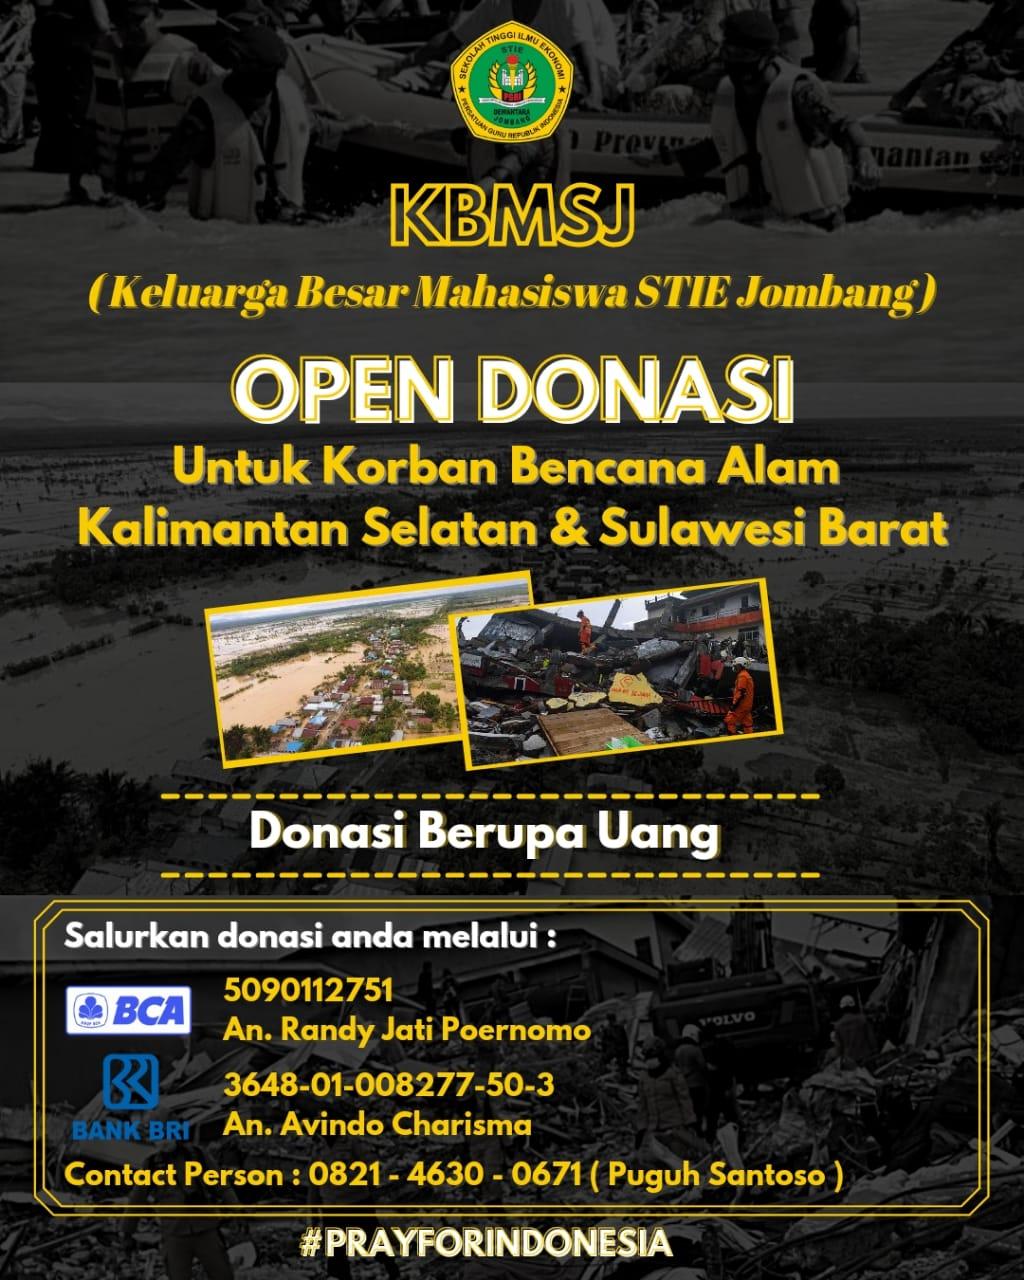 KBMSJ (Keluarga Besar Mahasiswa STIE Jombang) OPEN DONASI Untuk Korban Bencana Alam Kalimantan Selatan & Sulawesi Barat